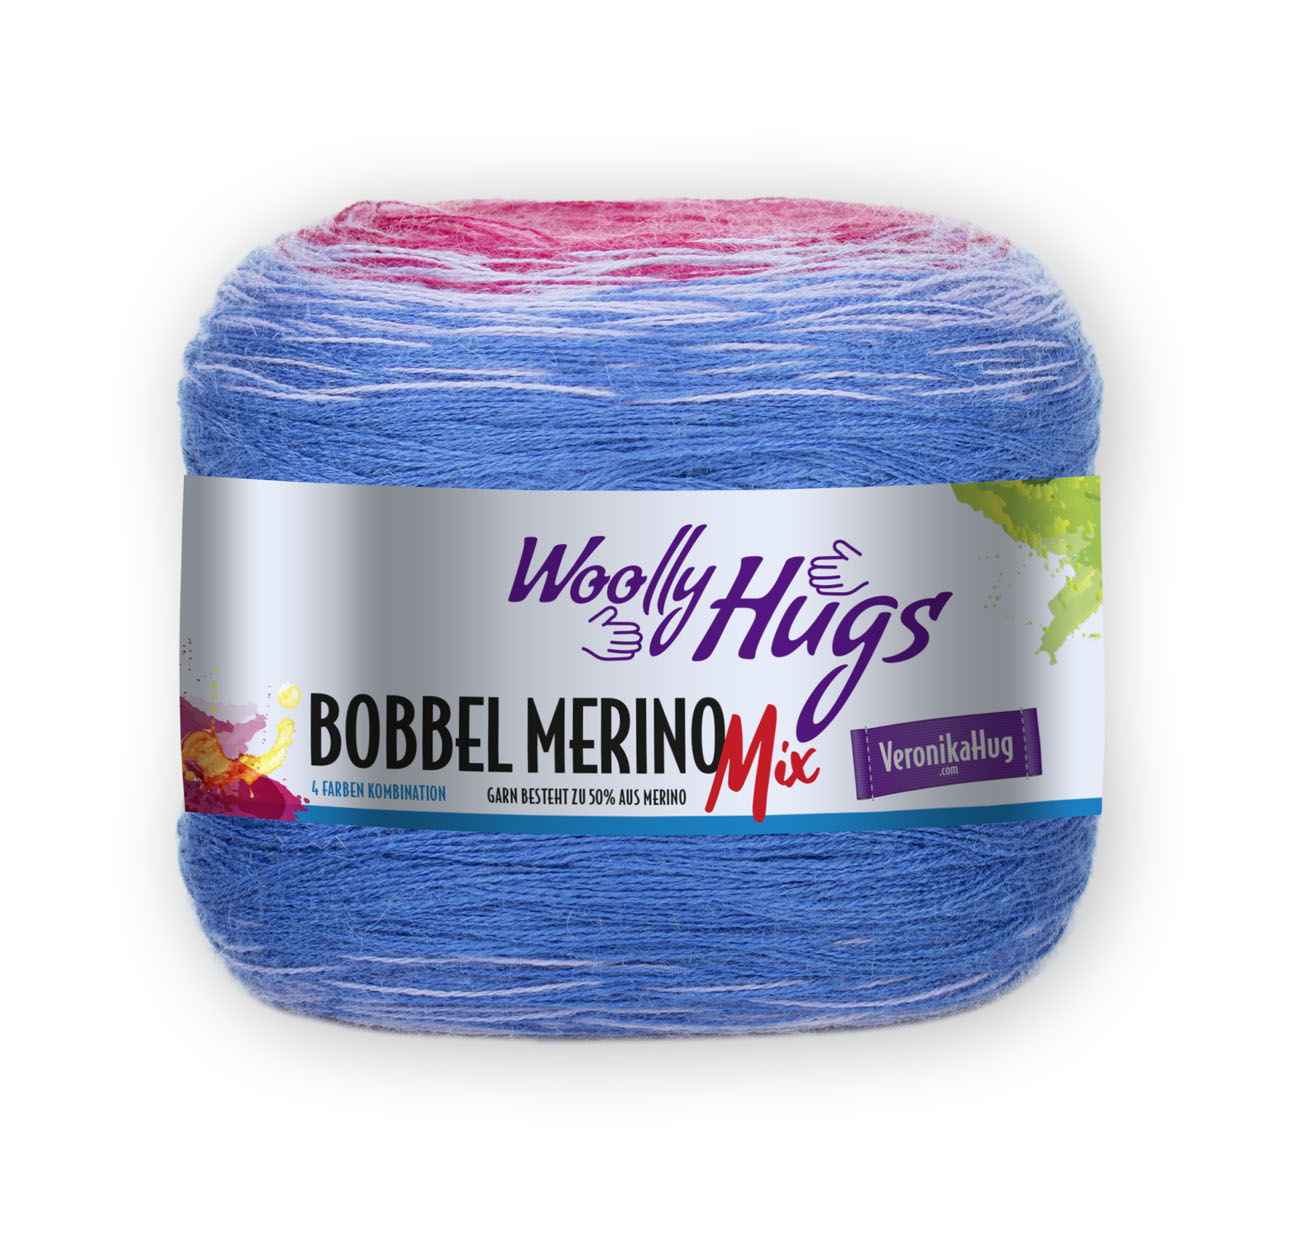 Woolly Hugs Bobbel Merinomix 703